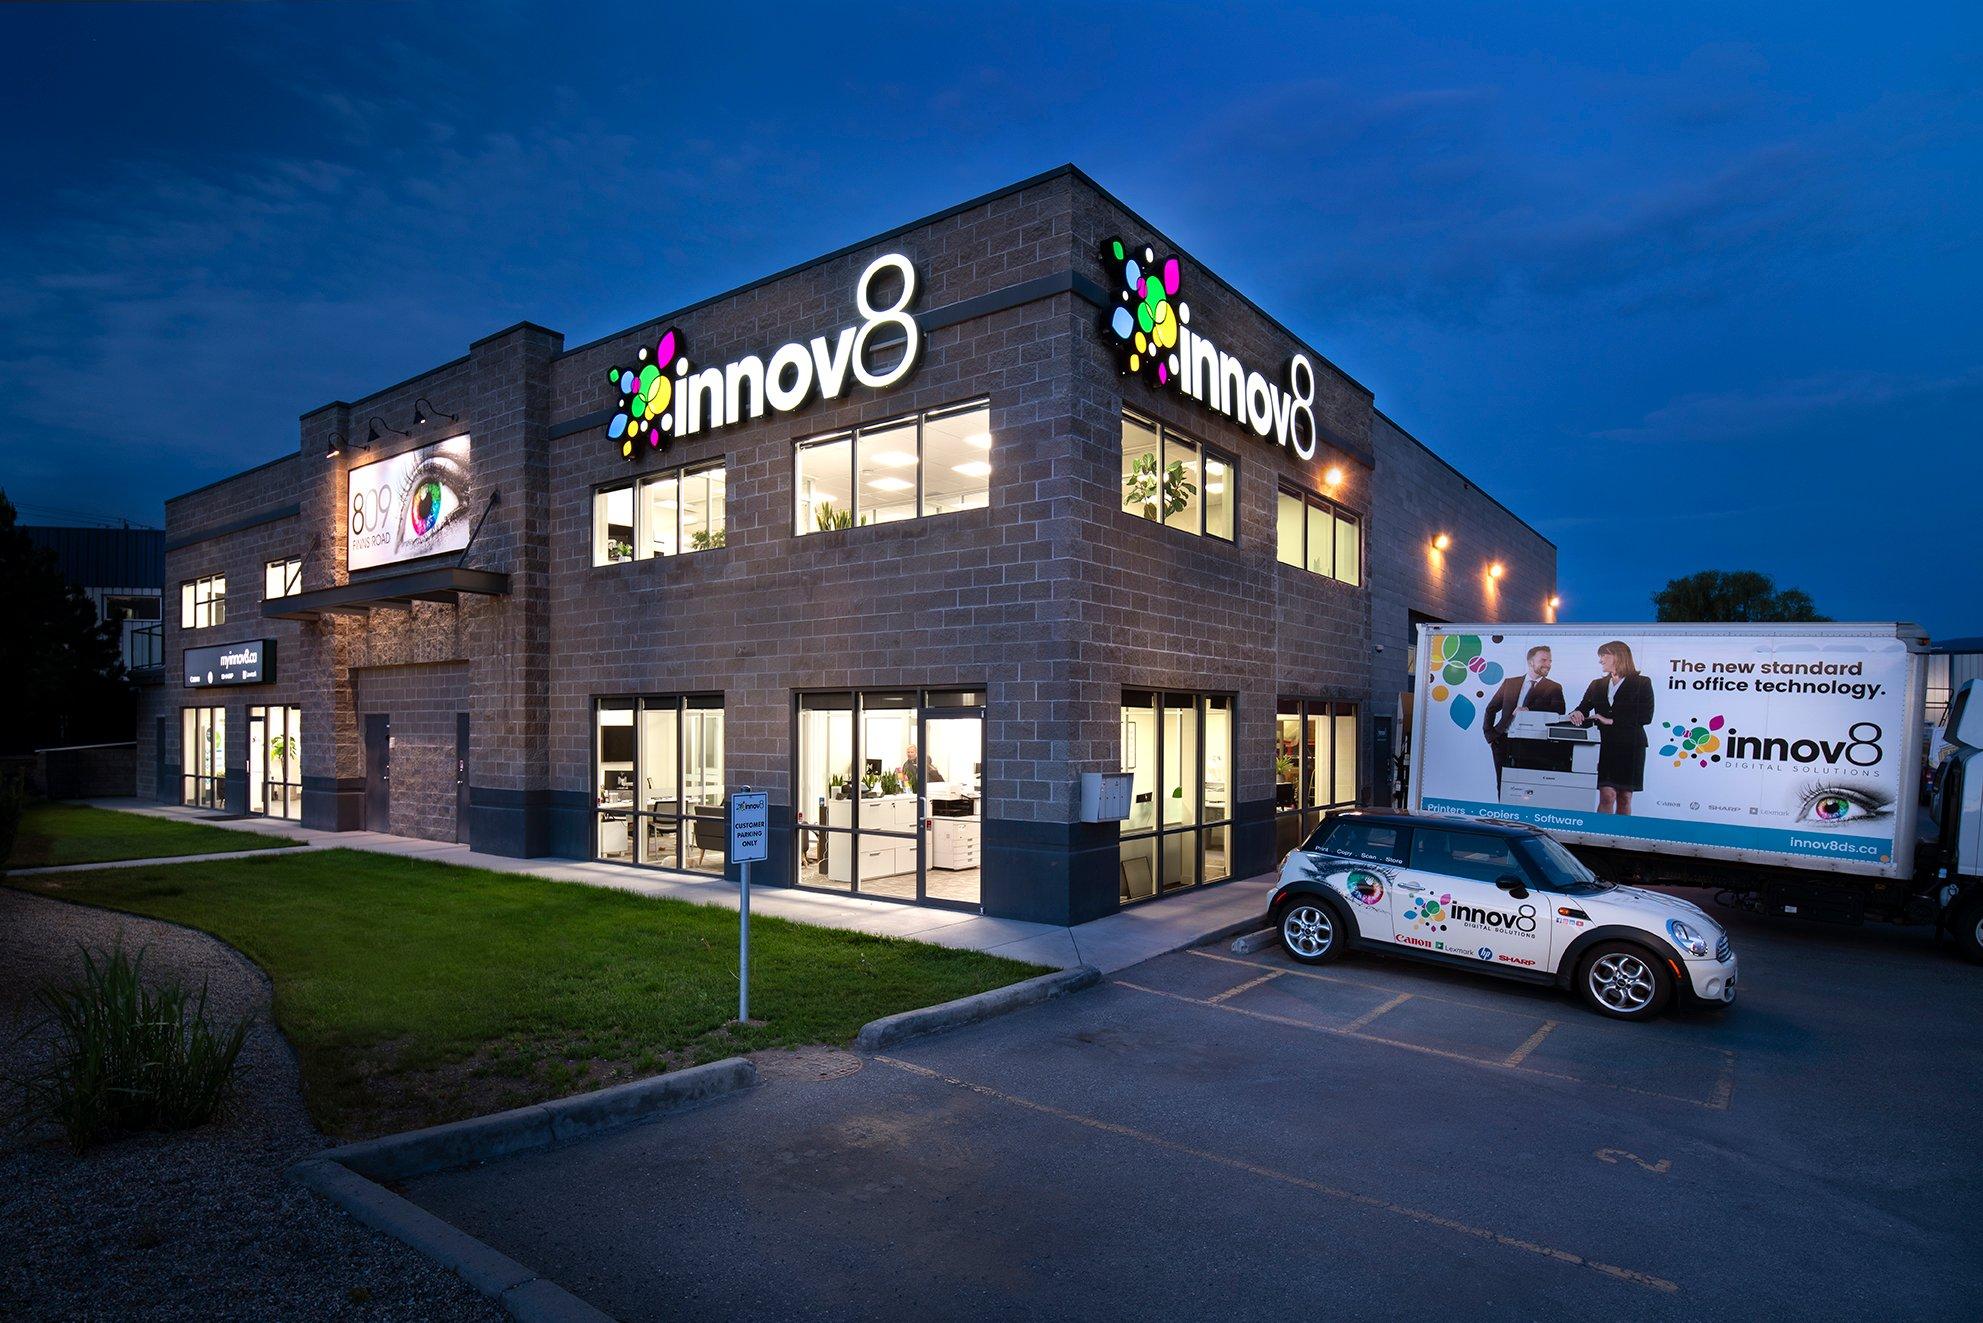 innov8-exterior-of-building